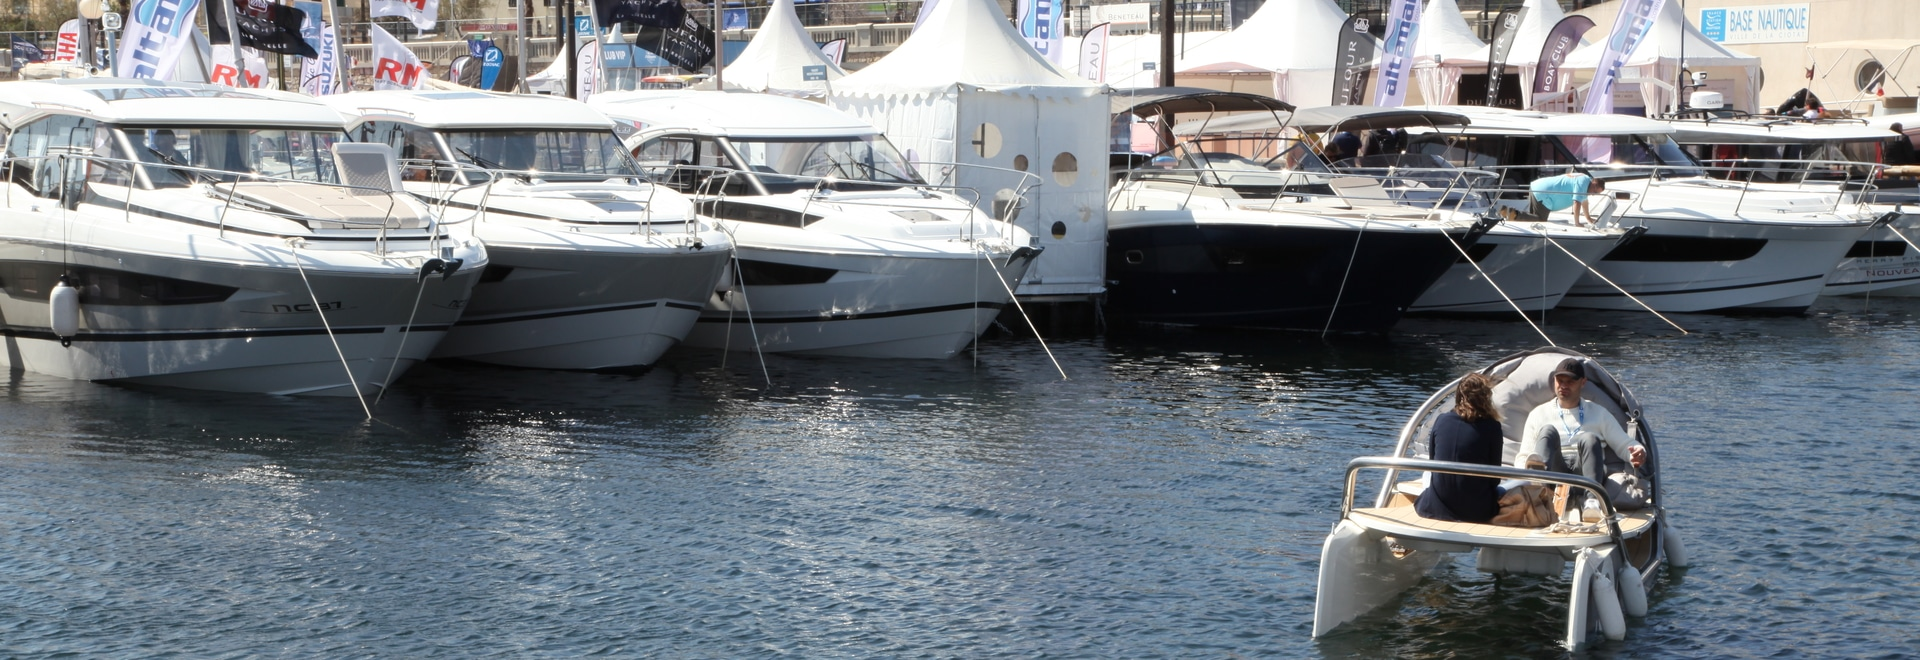 Ceclo auf dem Wasser in La Ciotat